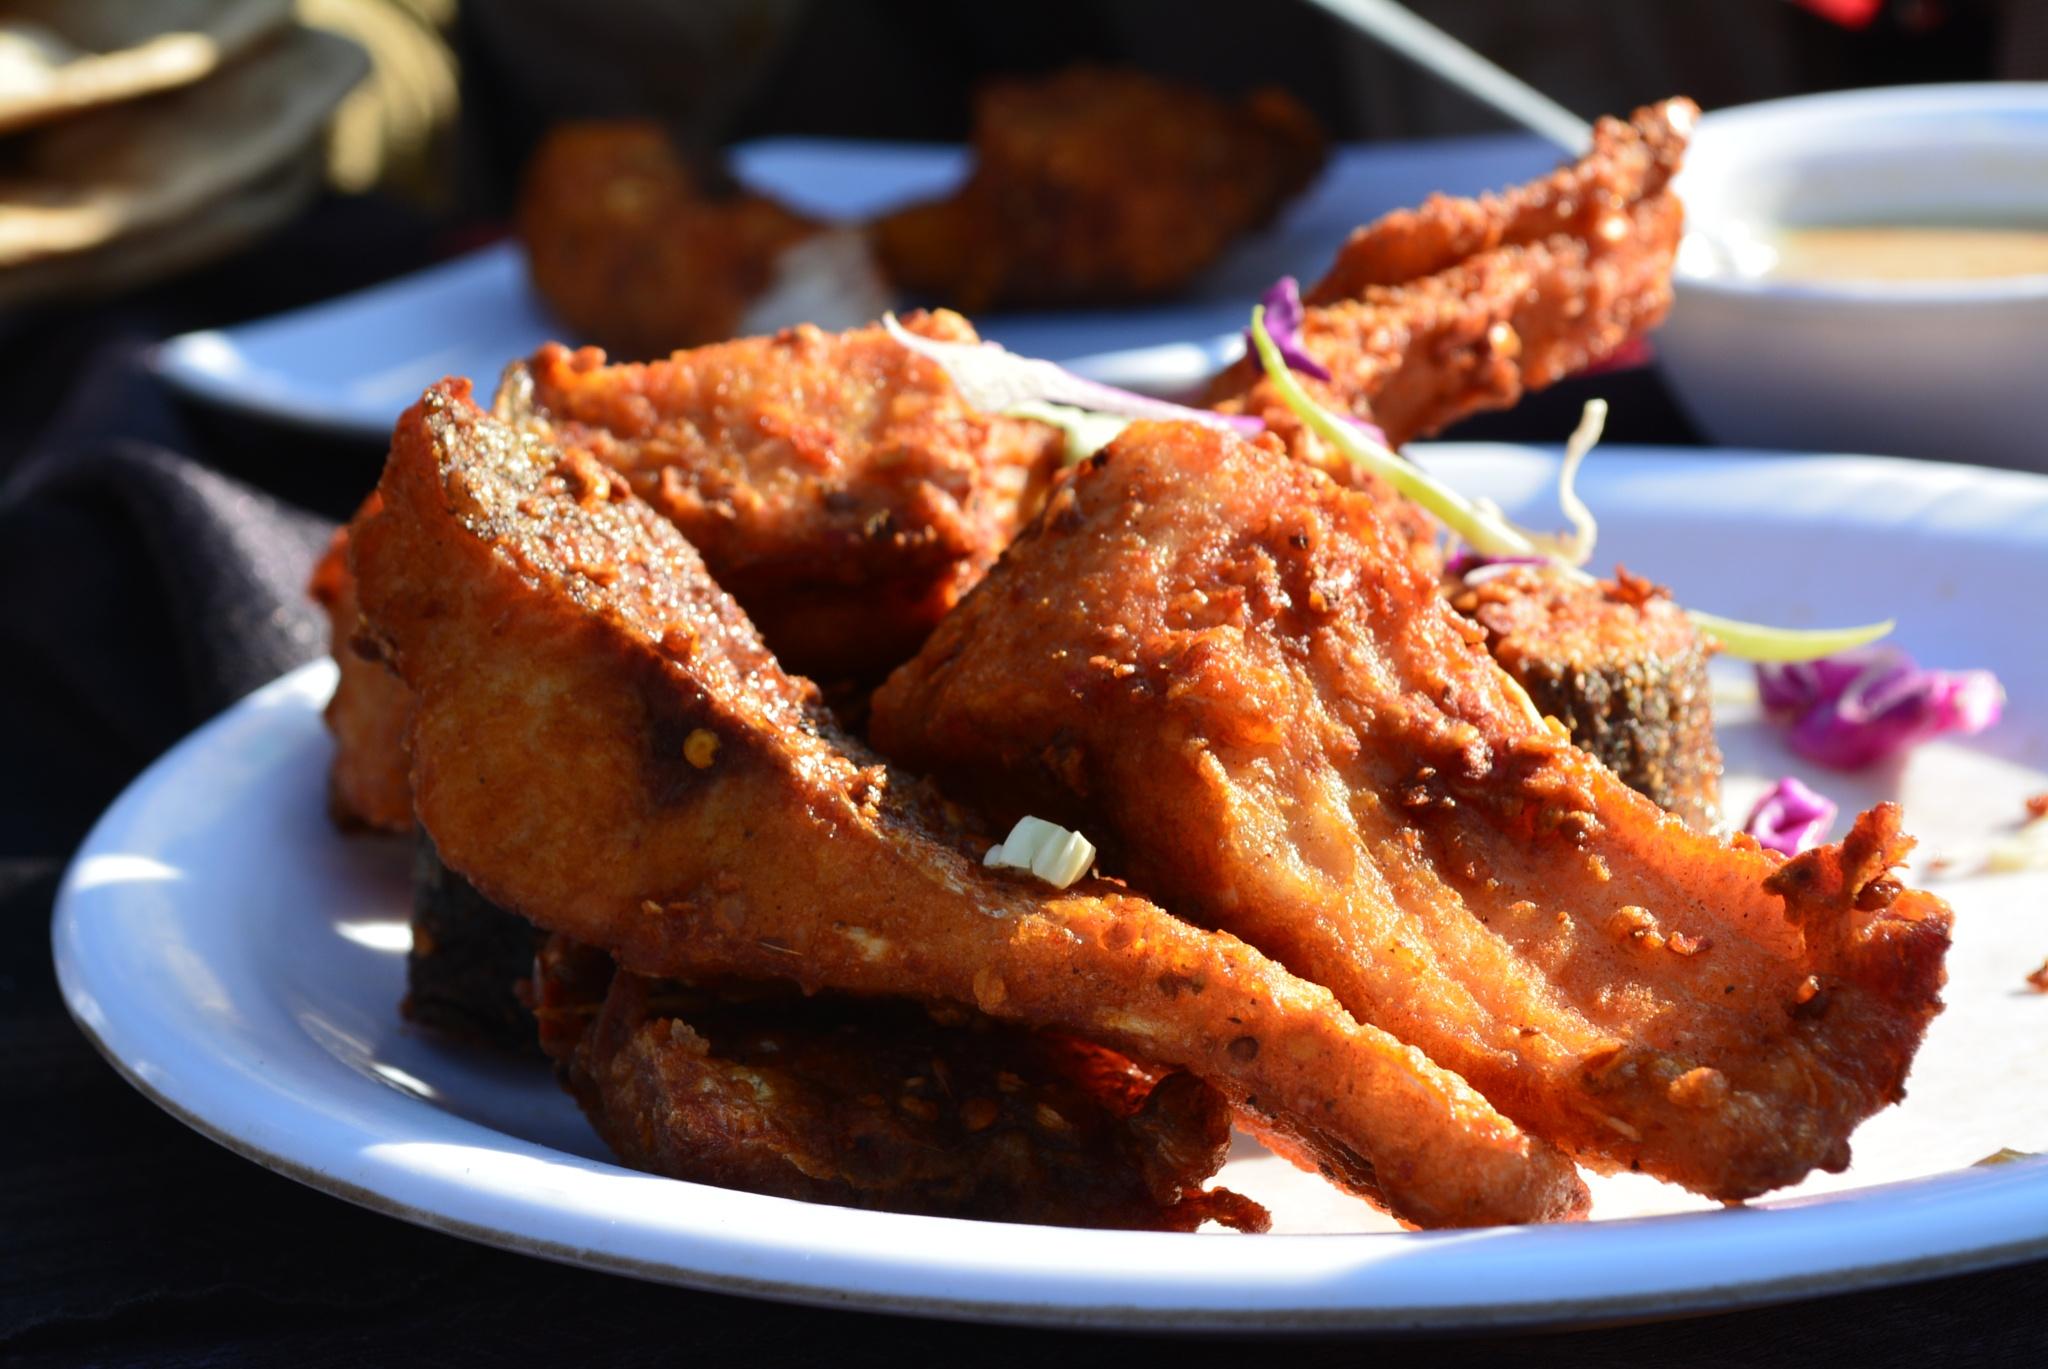 Fish of the Dish - Fishy Fishy Fishee by Syed Zulfiqar Naqvi